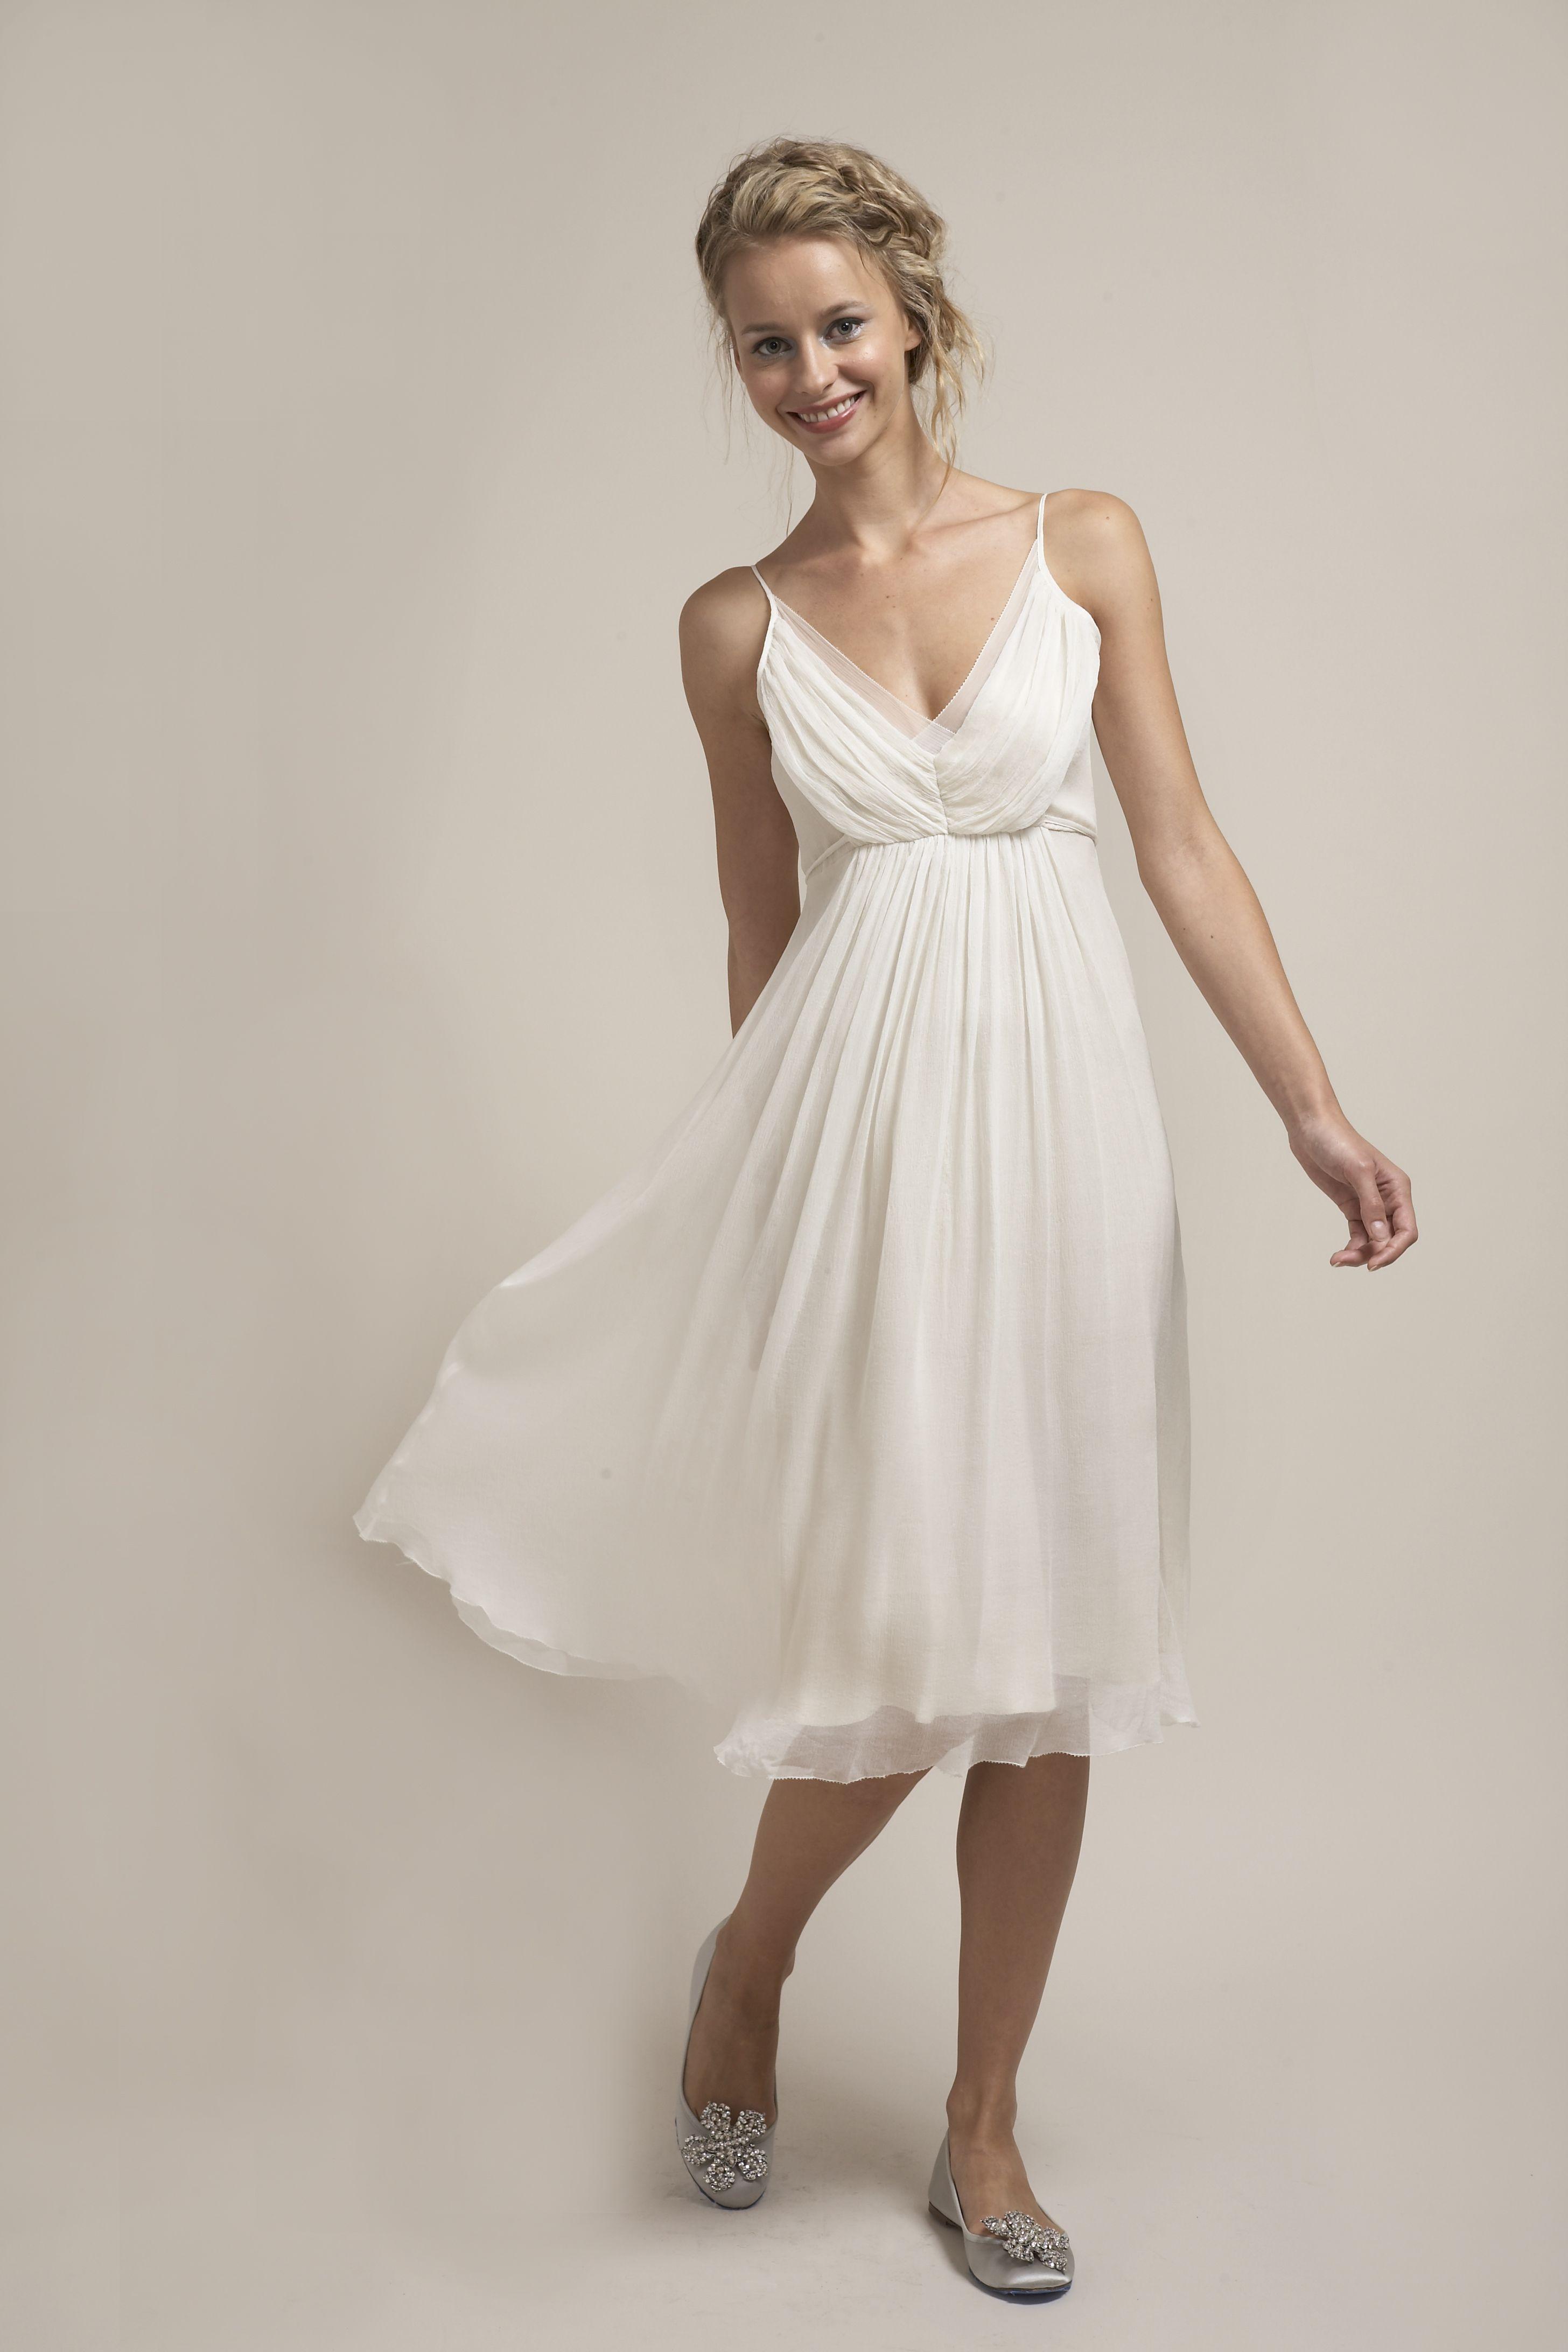 Hb6722 A Perfect Short Wedding Dress Casual Wedding Dress Short Wedding Dress Wedding Dresses Under 500